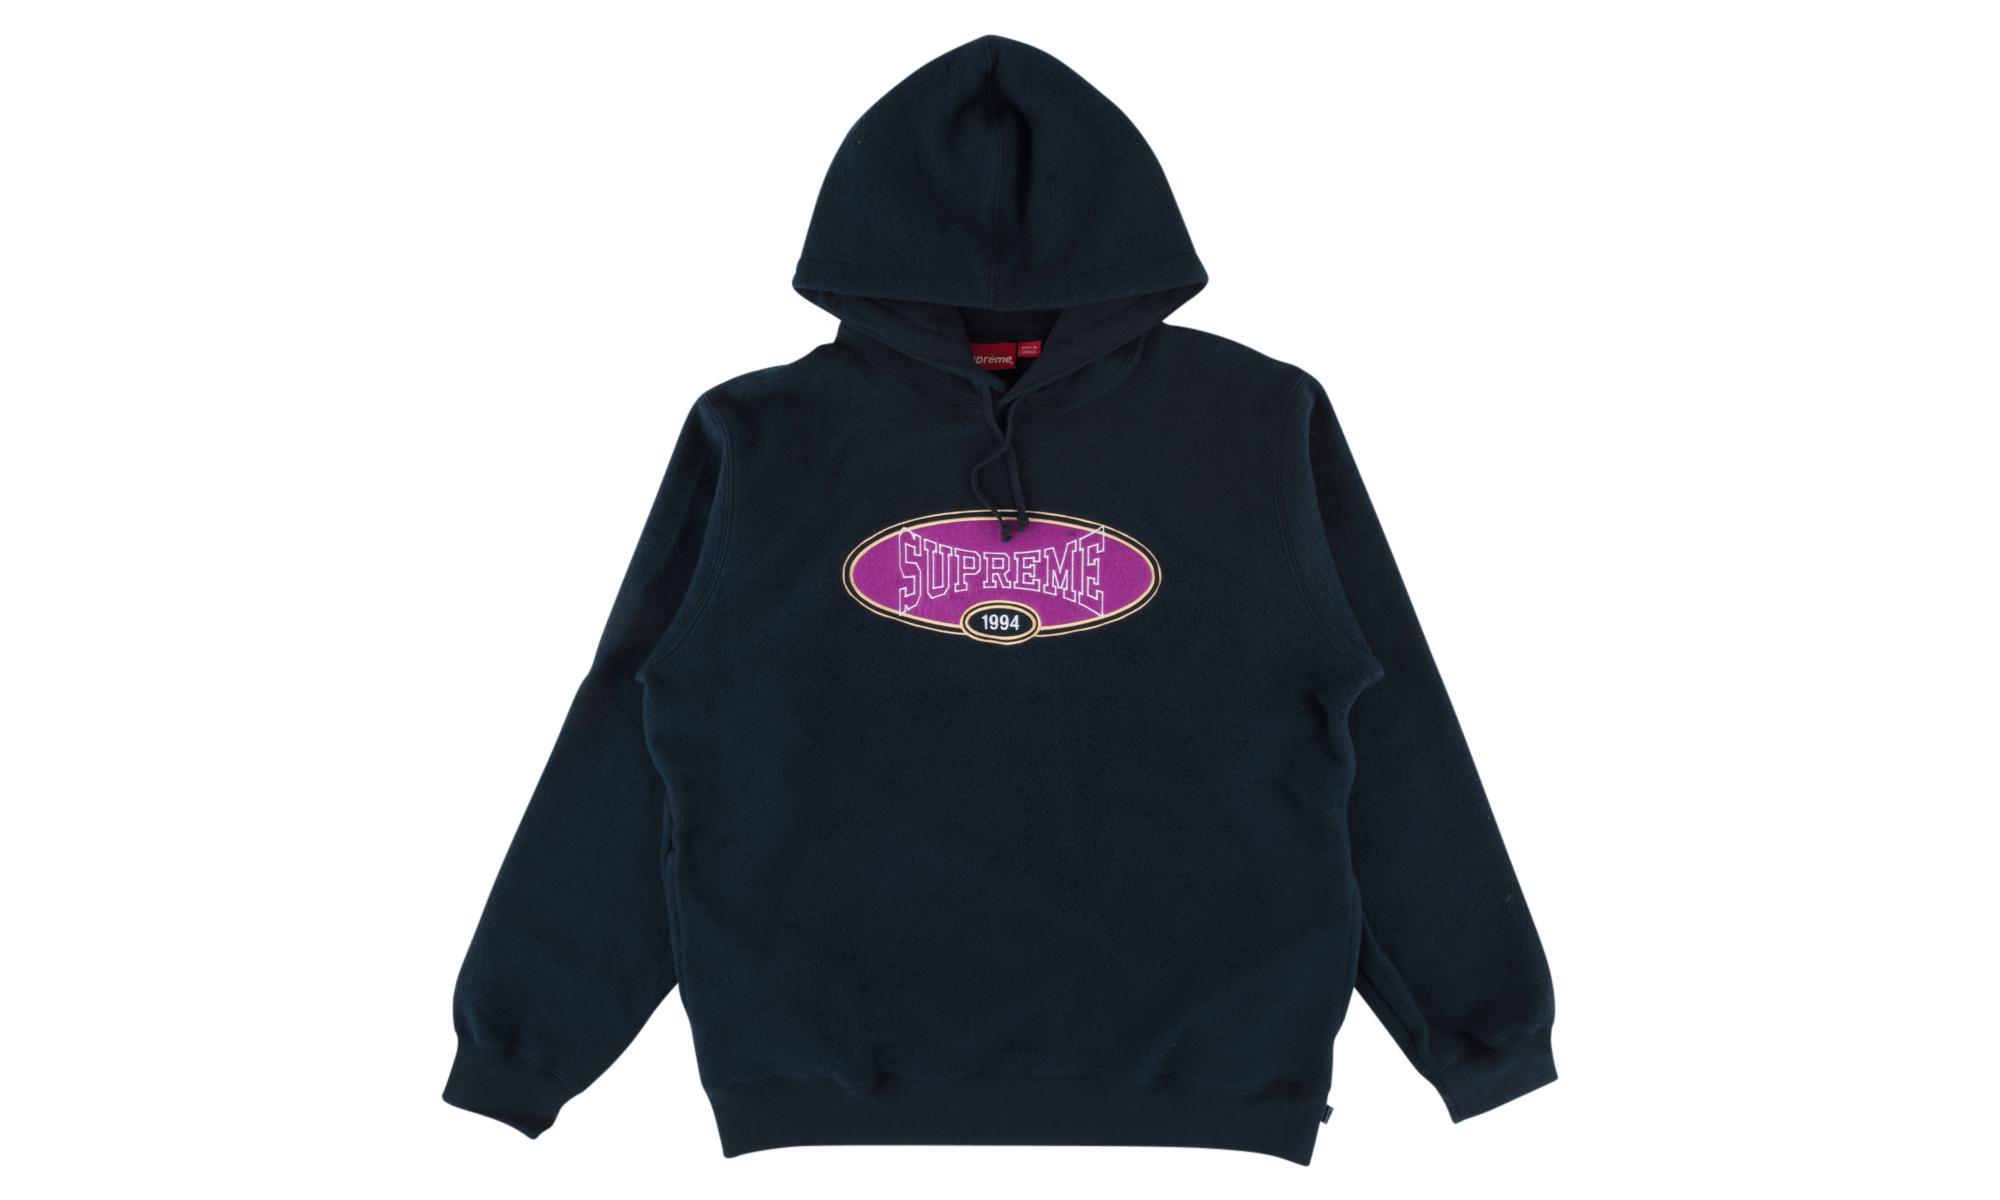 45994fc7 Supreme - Blue Reverse Fleece Hooded Sweatshirt for Men - Lyst. View  fullscreen